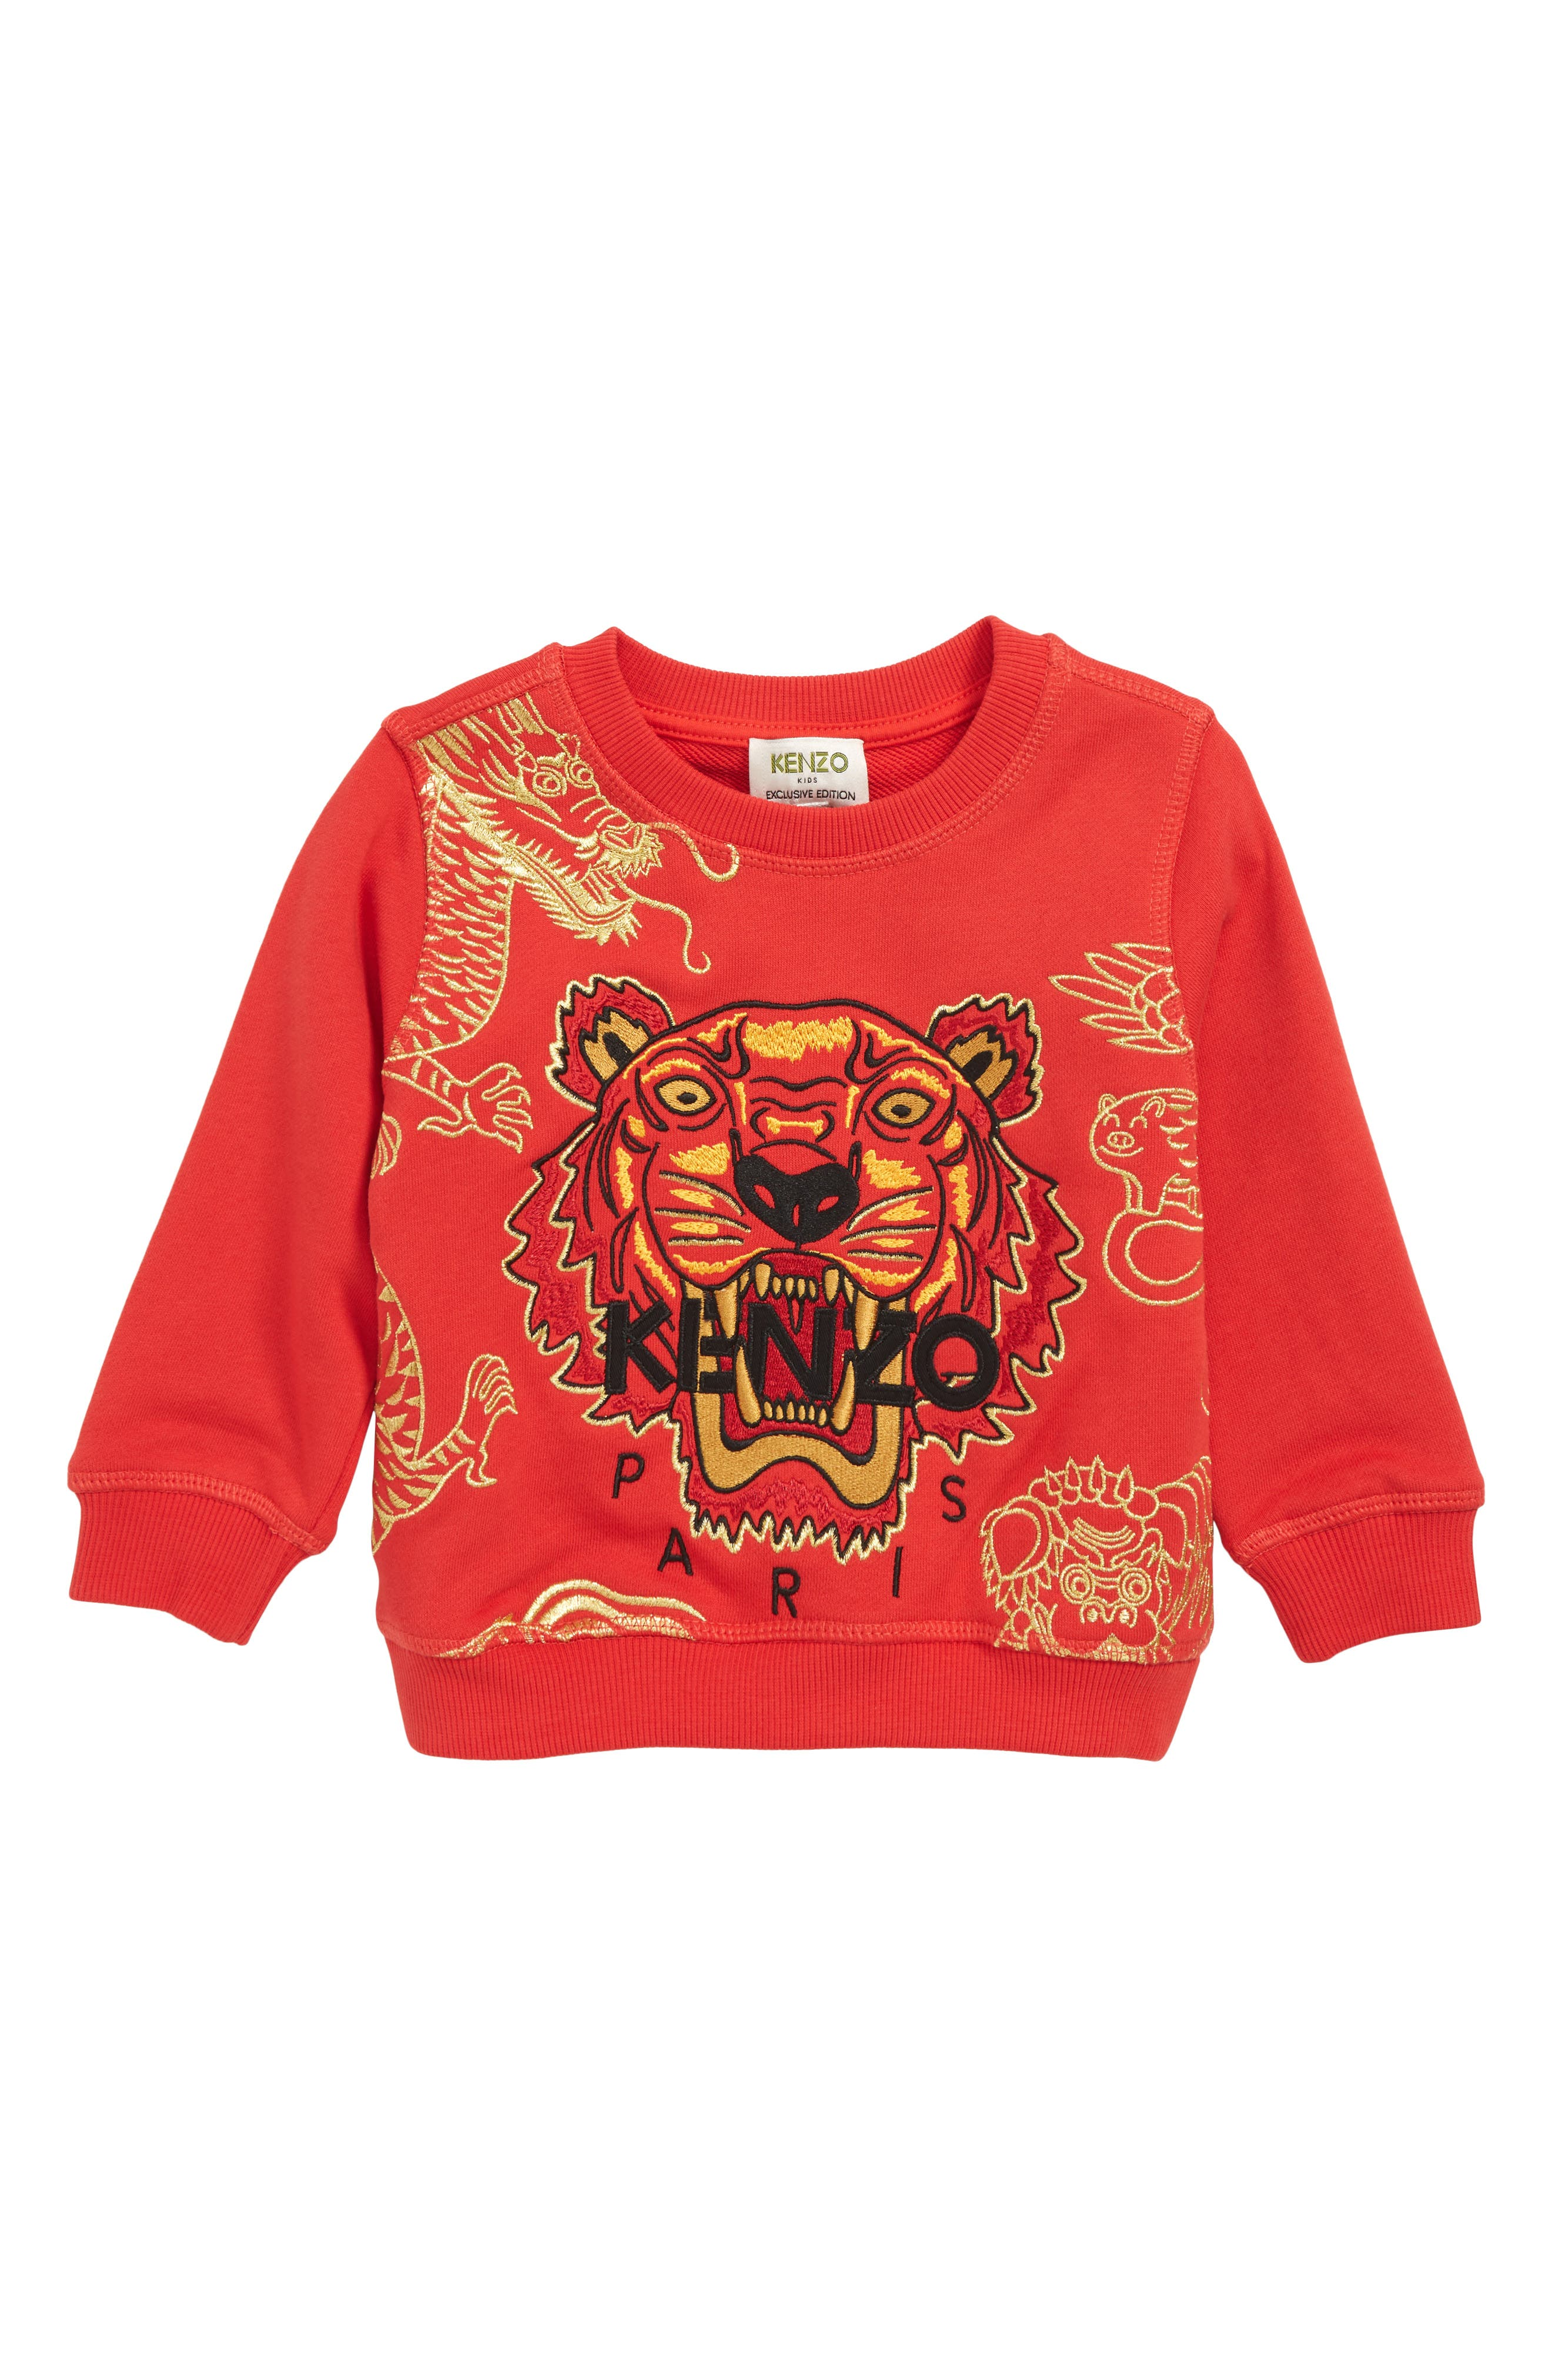 KENZO, Embroidered Tiger Logo Sweatshirt, Main thumbnail 1, color, RED